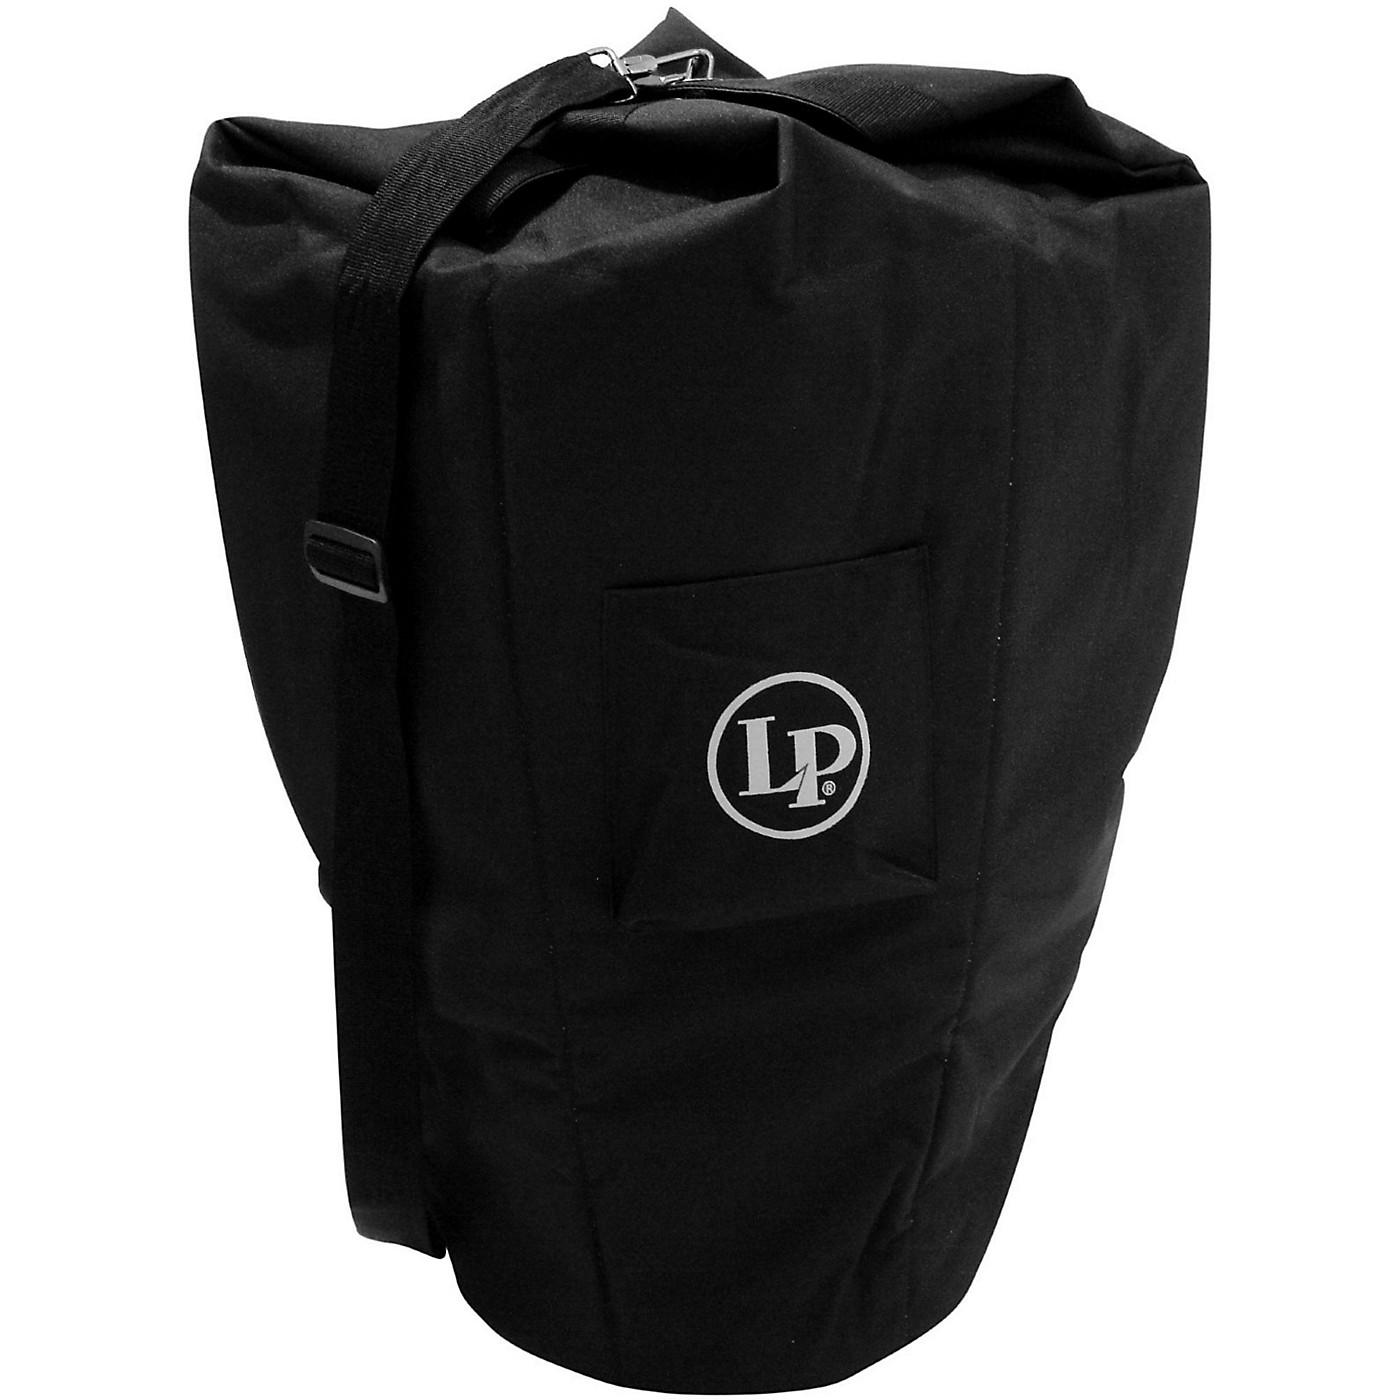 LP LP542 Fits-All Conga Bag thumbnail